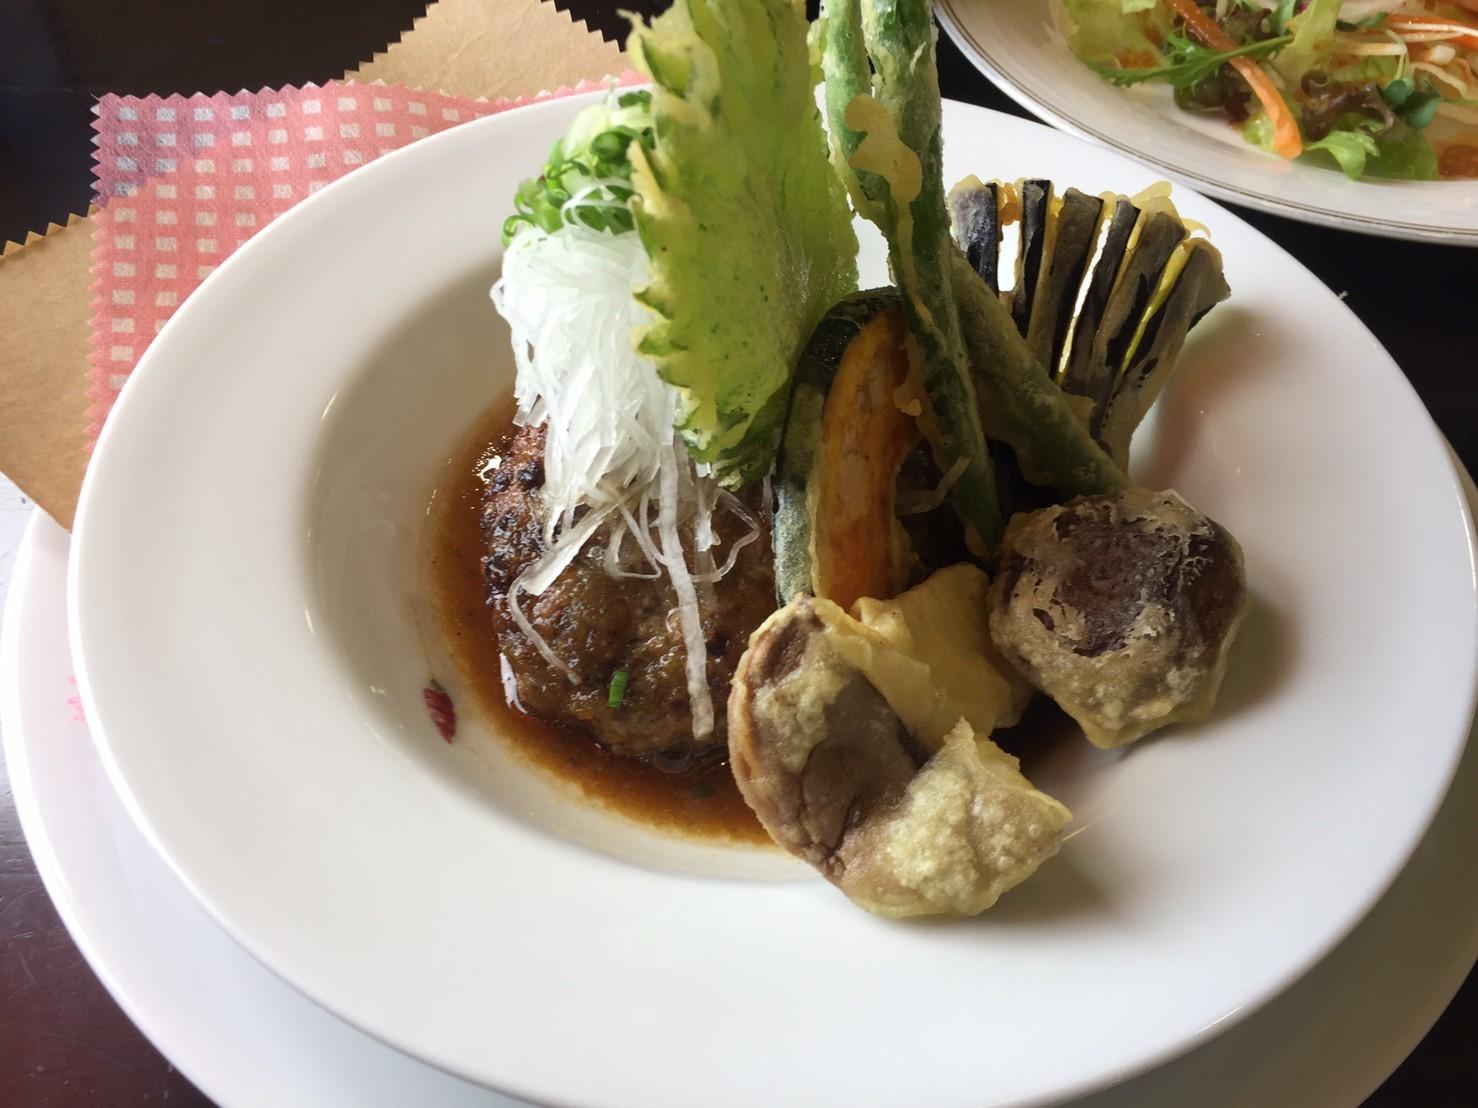 cafe & restaurant アンドリュース 日替わりランチ  ラス1和風ハンバーグ_e0115904_19393951.jpg